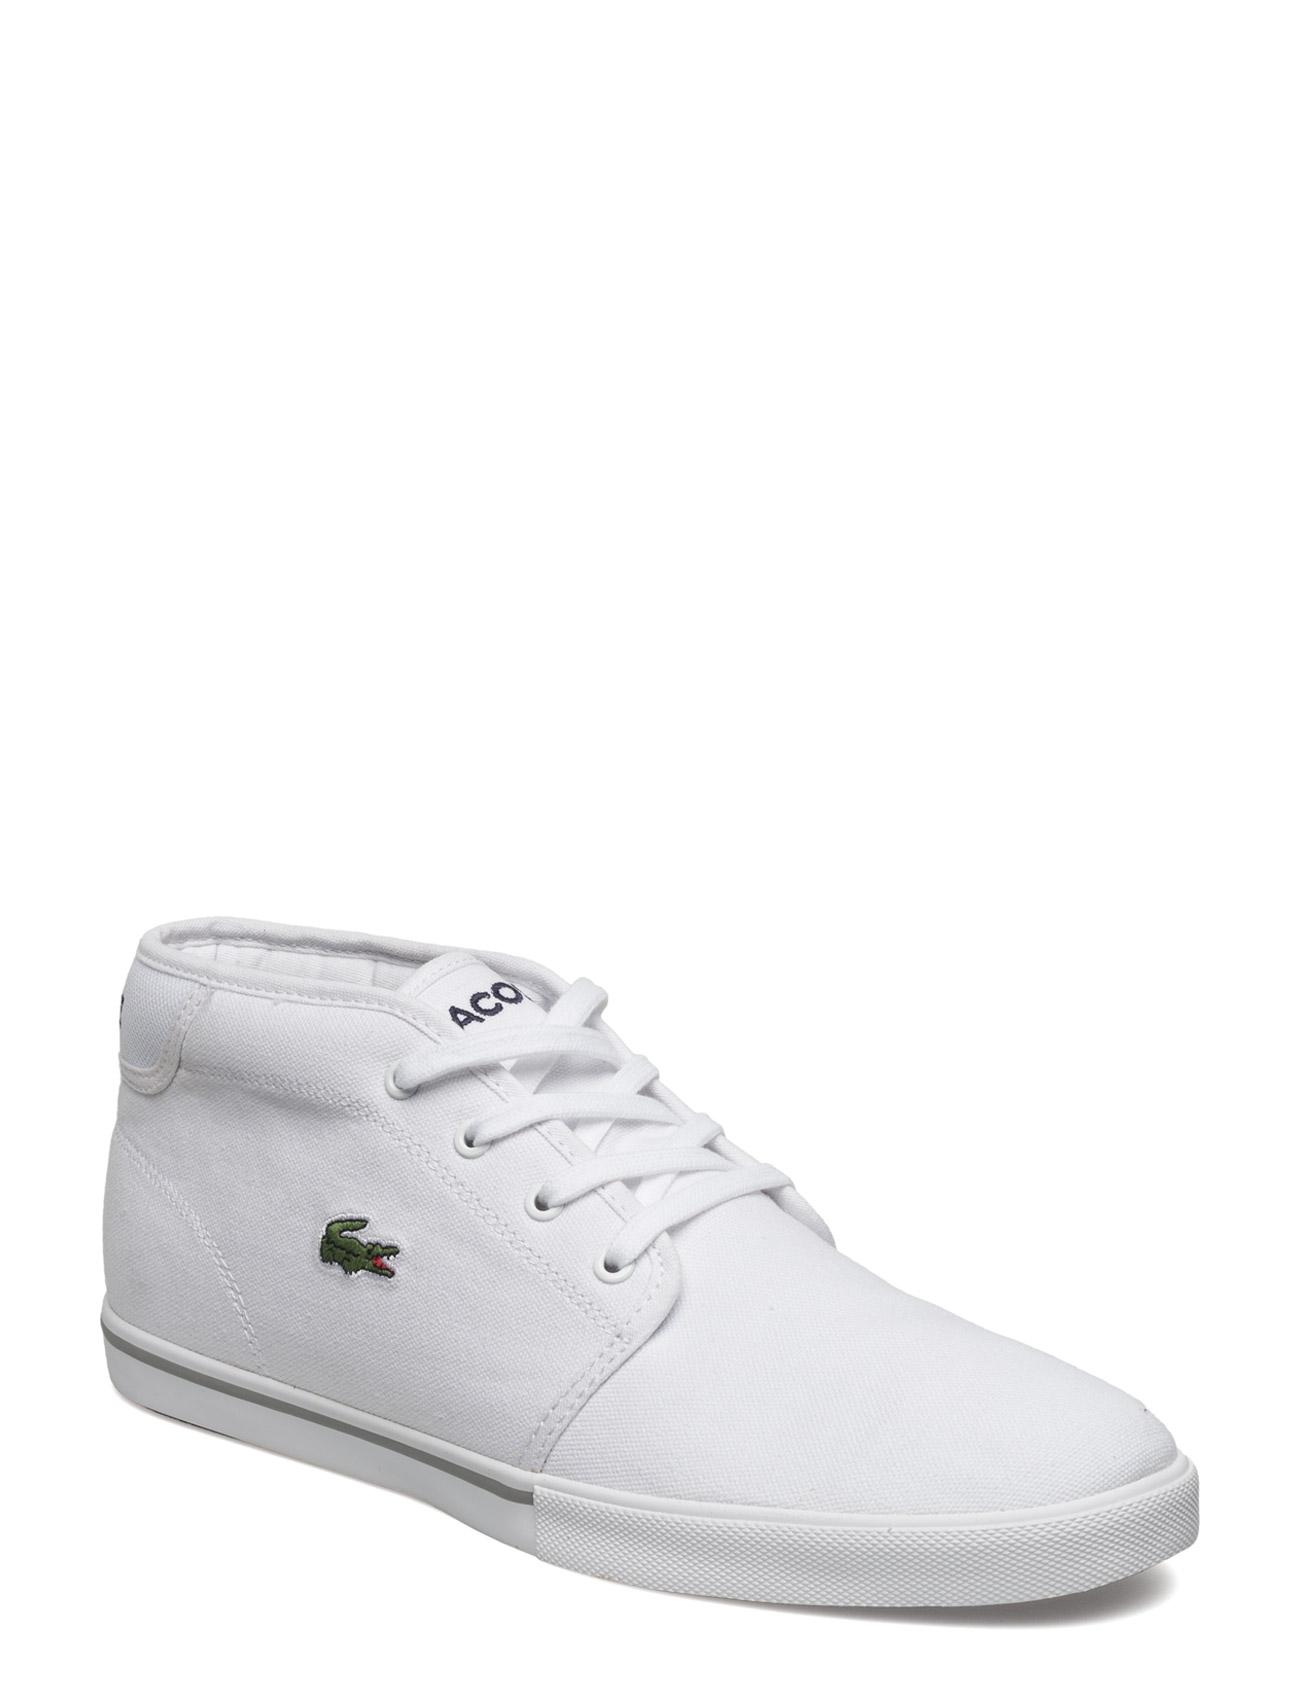 lacoste shoes – Ampthill lcr2 på boozt.com dk